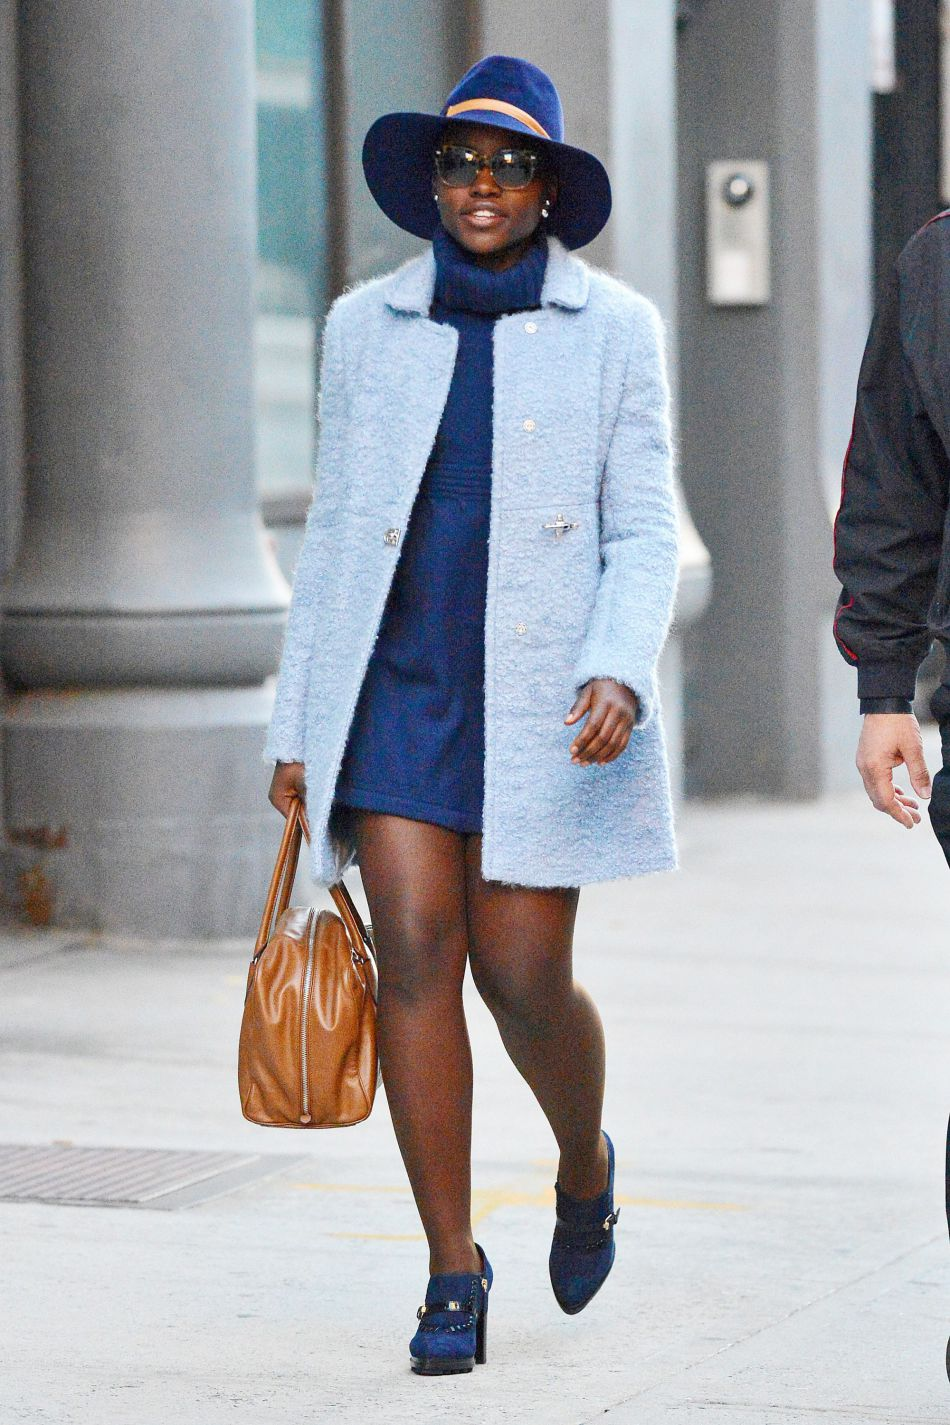 Lupita Nyong'o craque pour le preppy dans ses street styles.